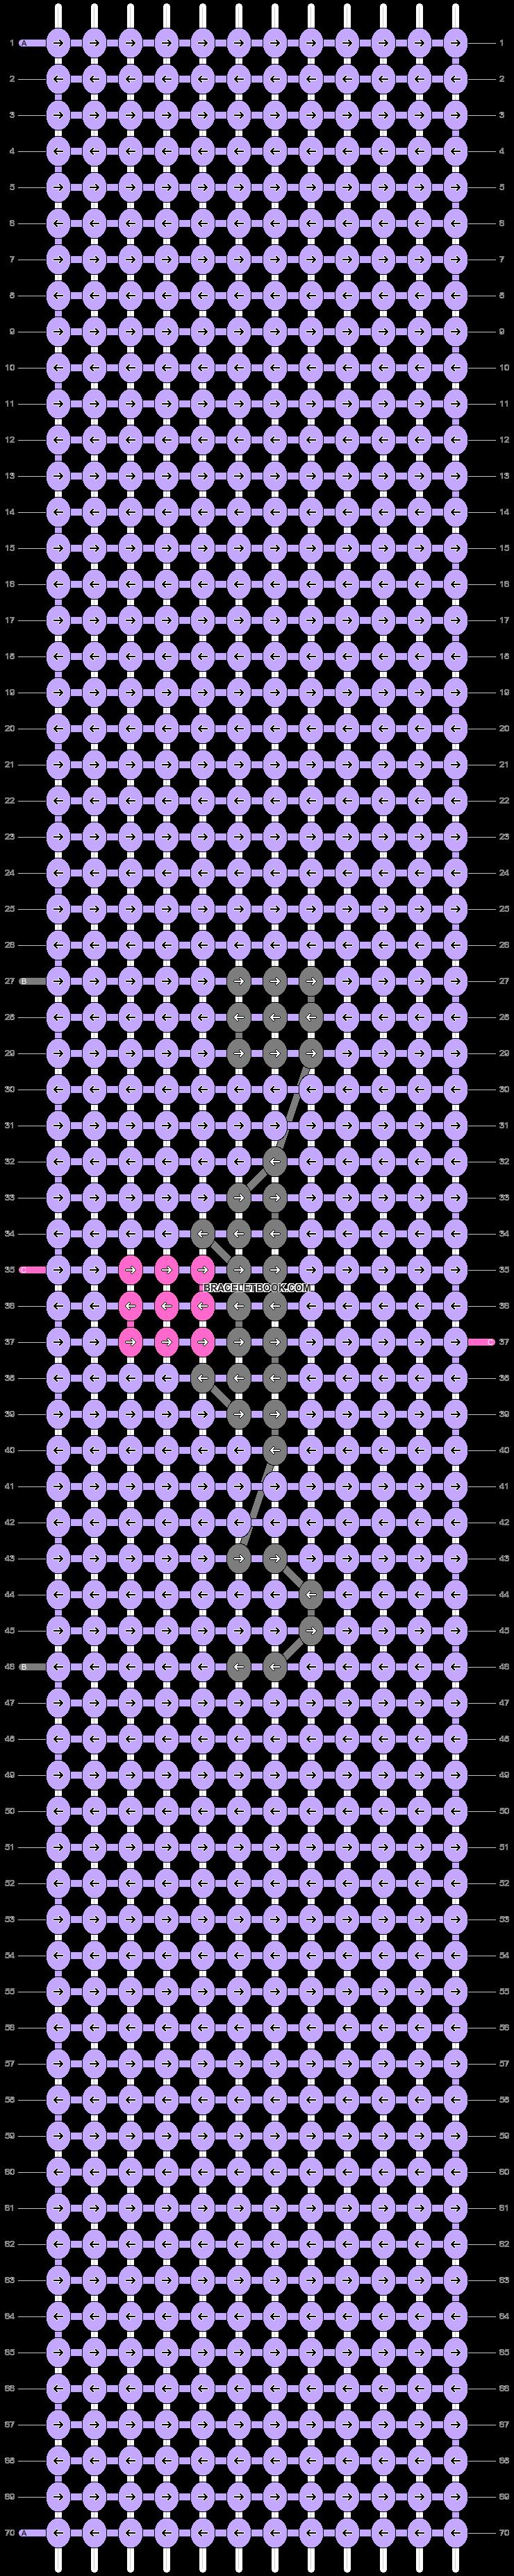 Alpha pattern #44813 variation #65411 pattern